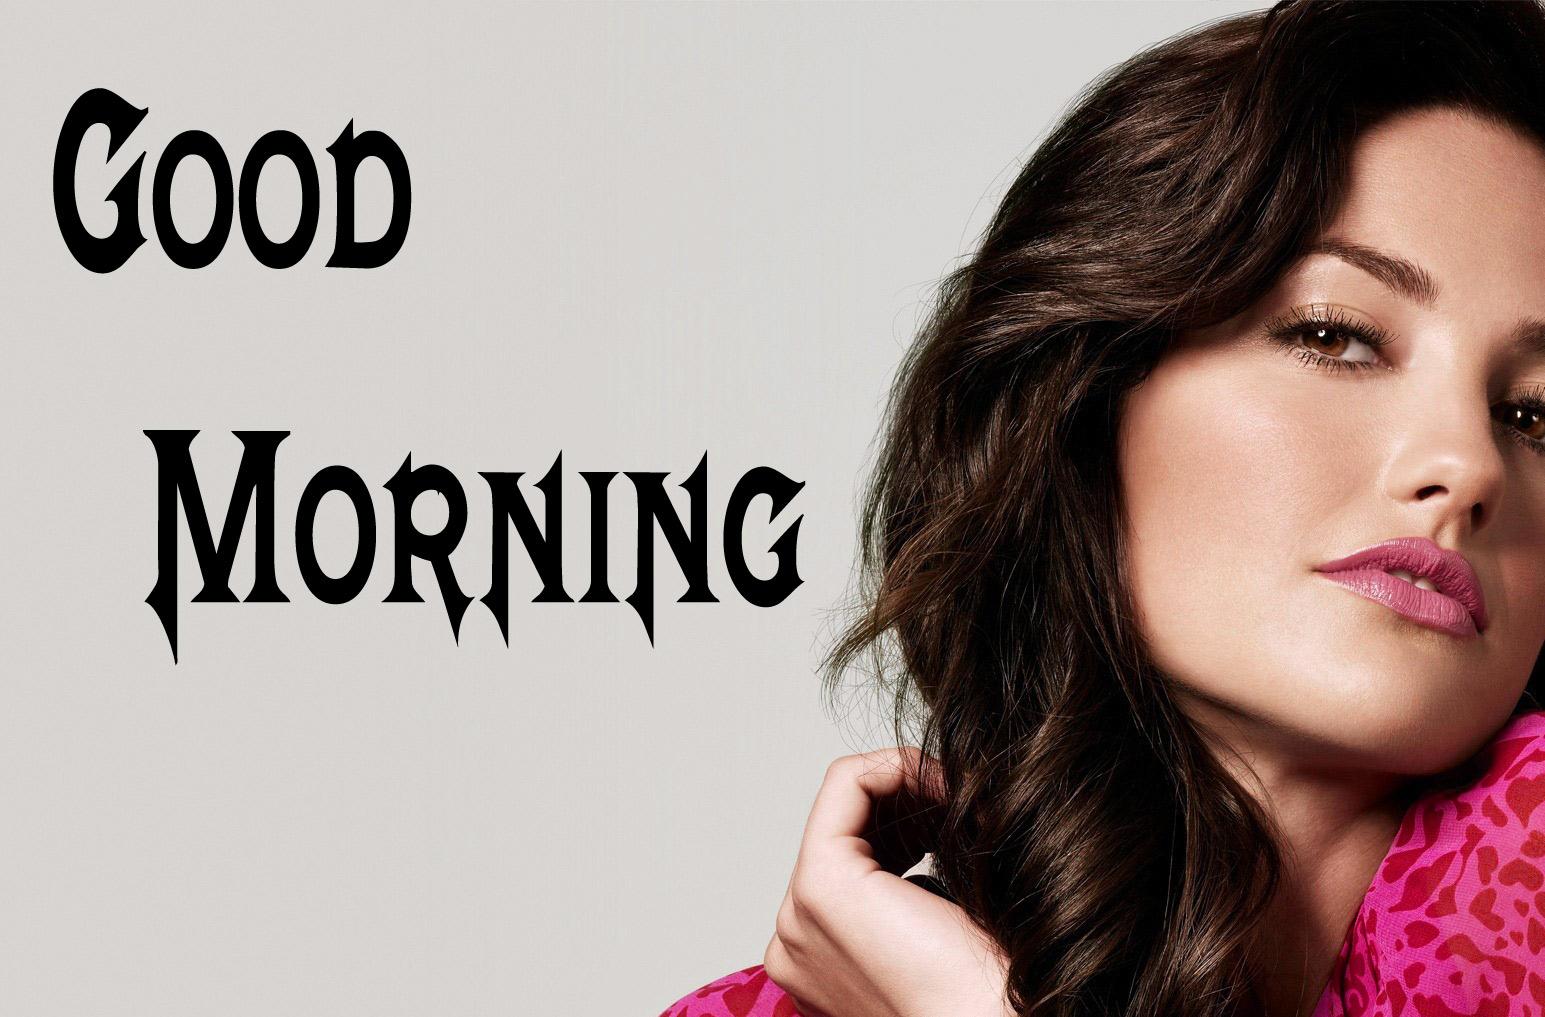 good morning Images for girls 21